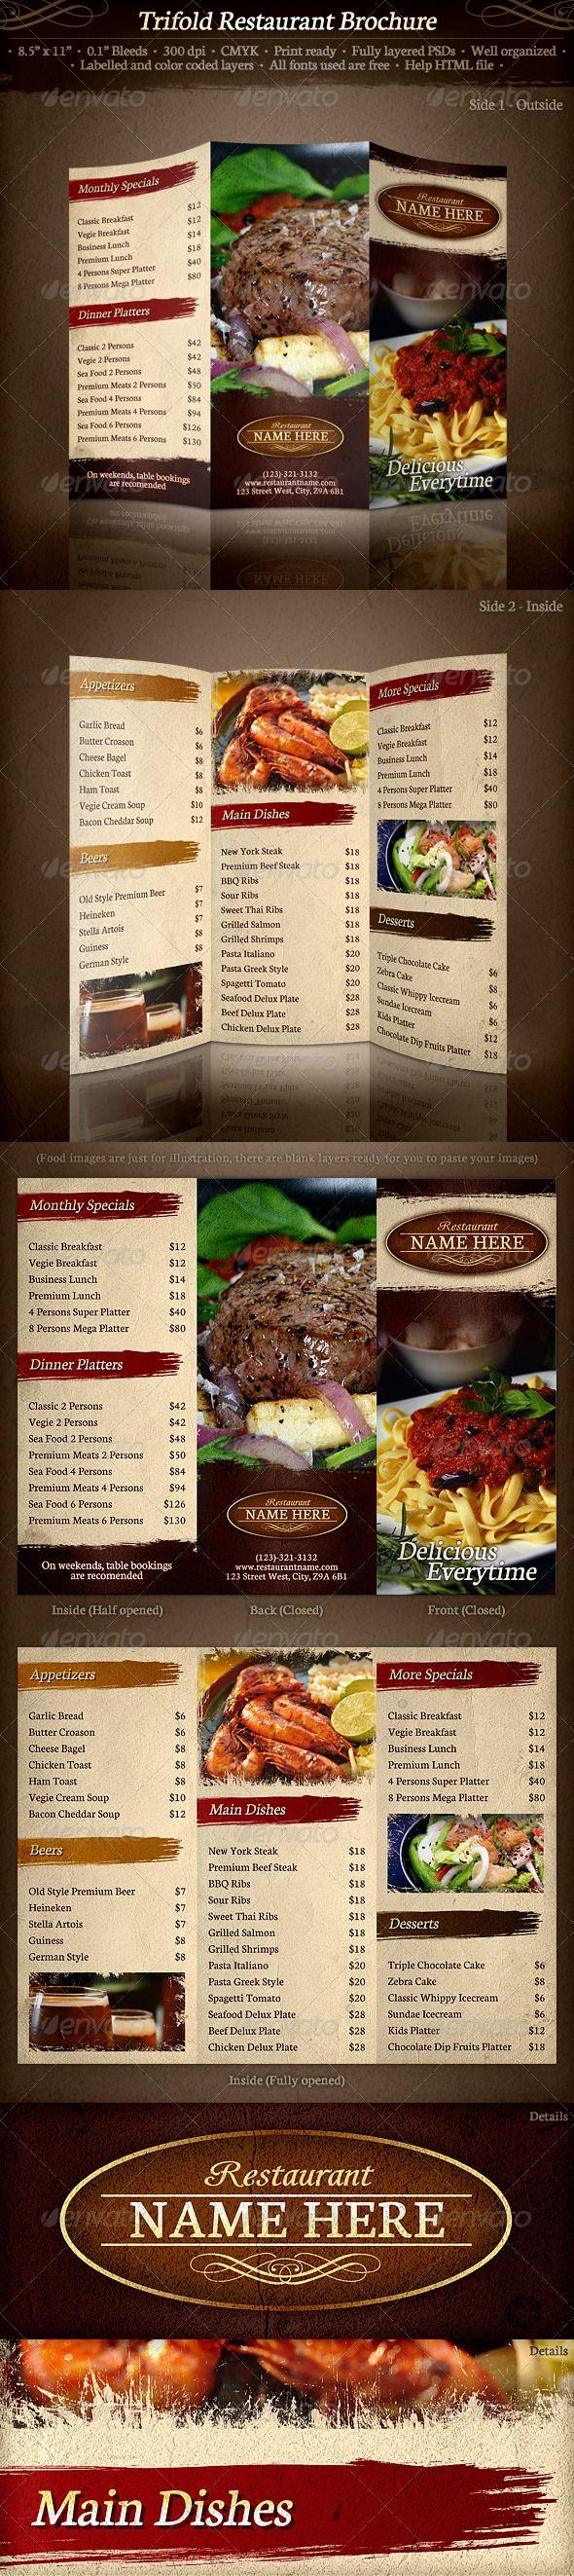 TriFold Restaurant Brochure Template - Food Menus Print Templates Download here : http://graphicriver.net/item/trifold-restaurant-brochure-template/336772?s_rank=1509&ref=Al-fatih